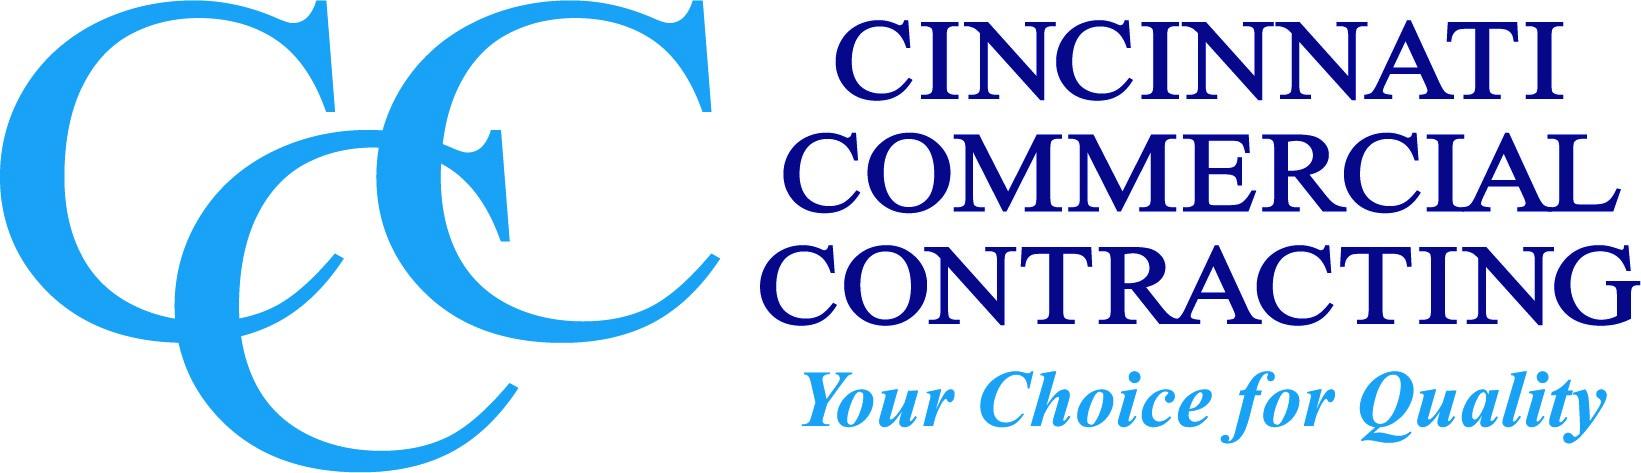 Birdie Sponsor - Cincinnati Commercial Contracting - Logo